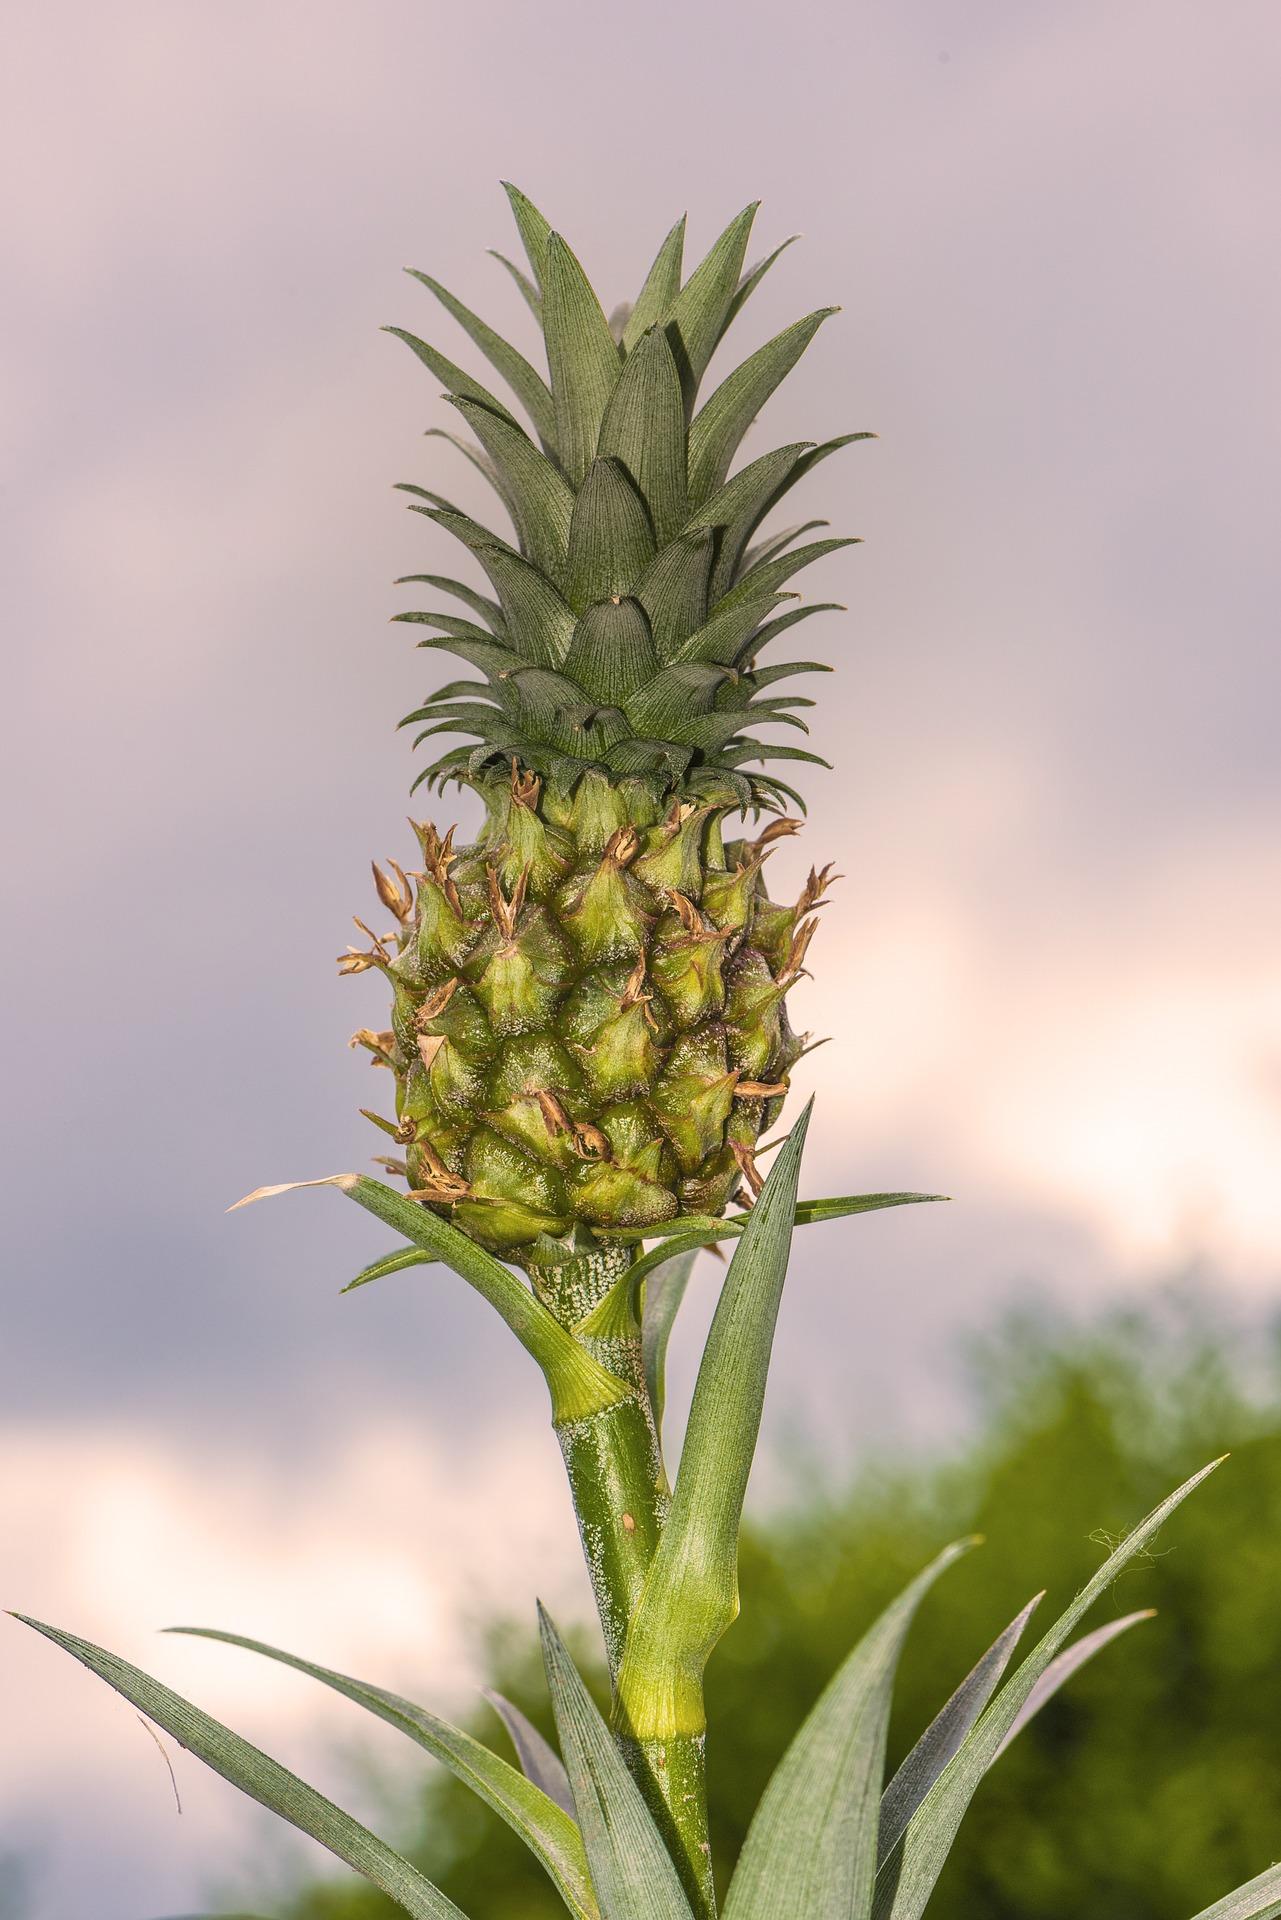 Local Pineapple Pixabay Public Domain